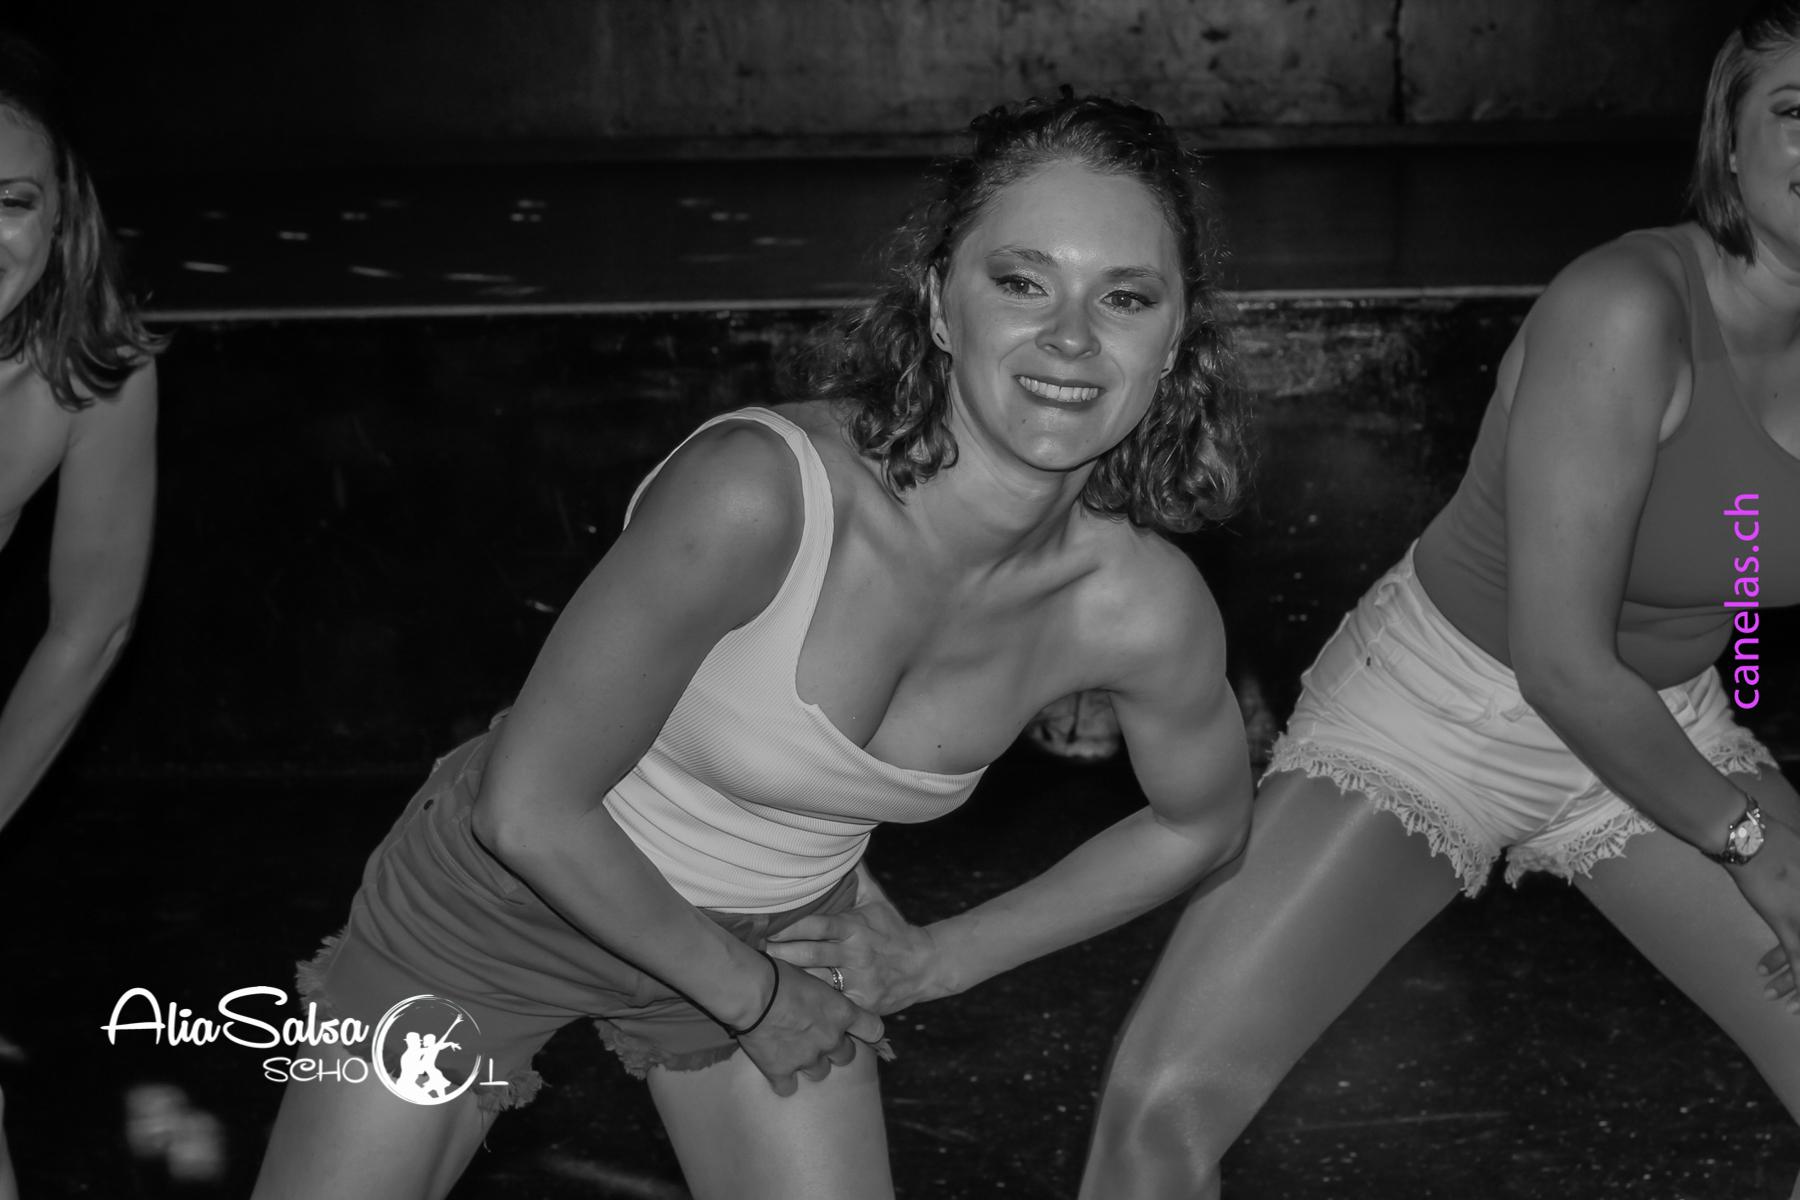 AliaSalsa ecole de danse lausanne soiree bachata salsa cubaineAlia Salsa Soireé Salsa - Bachata-3